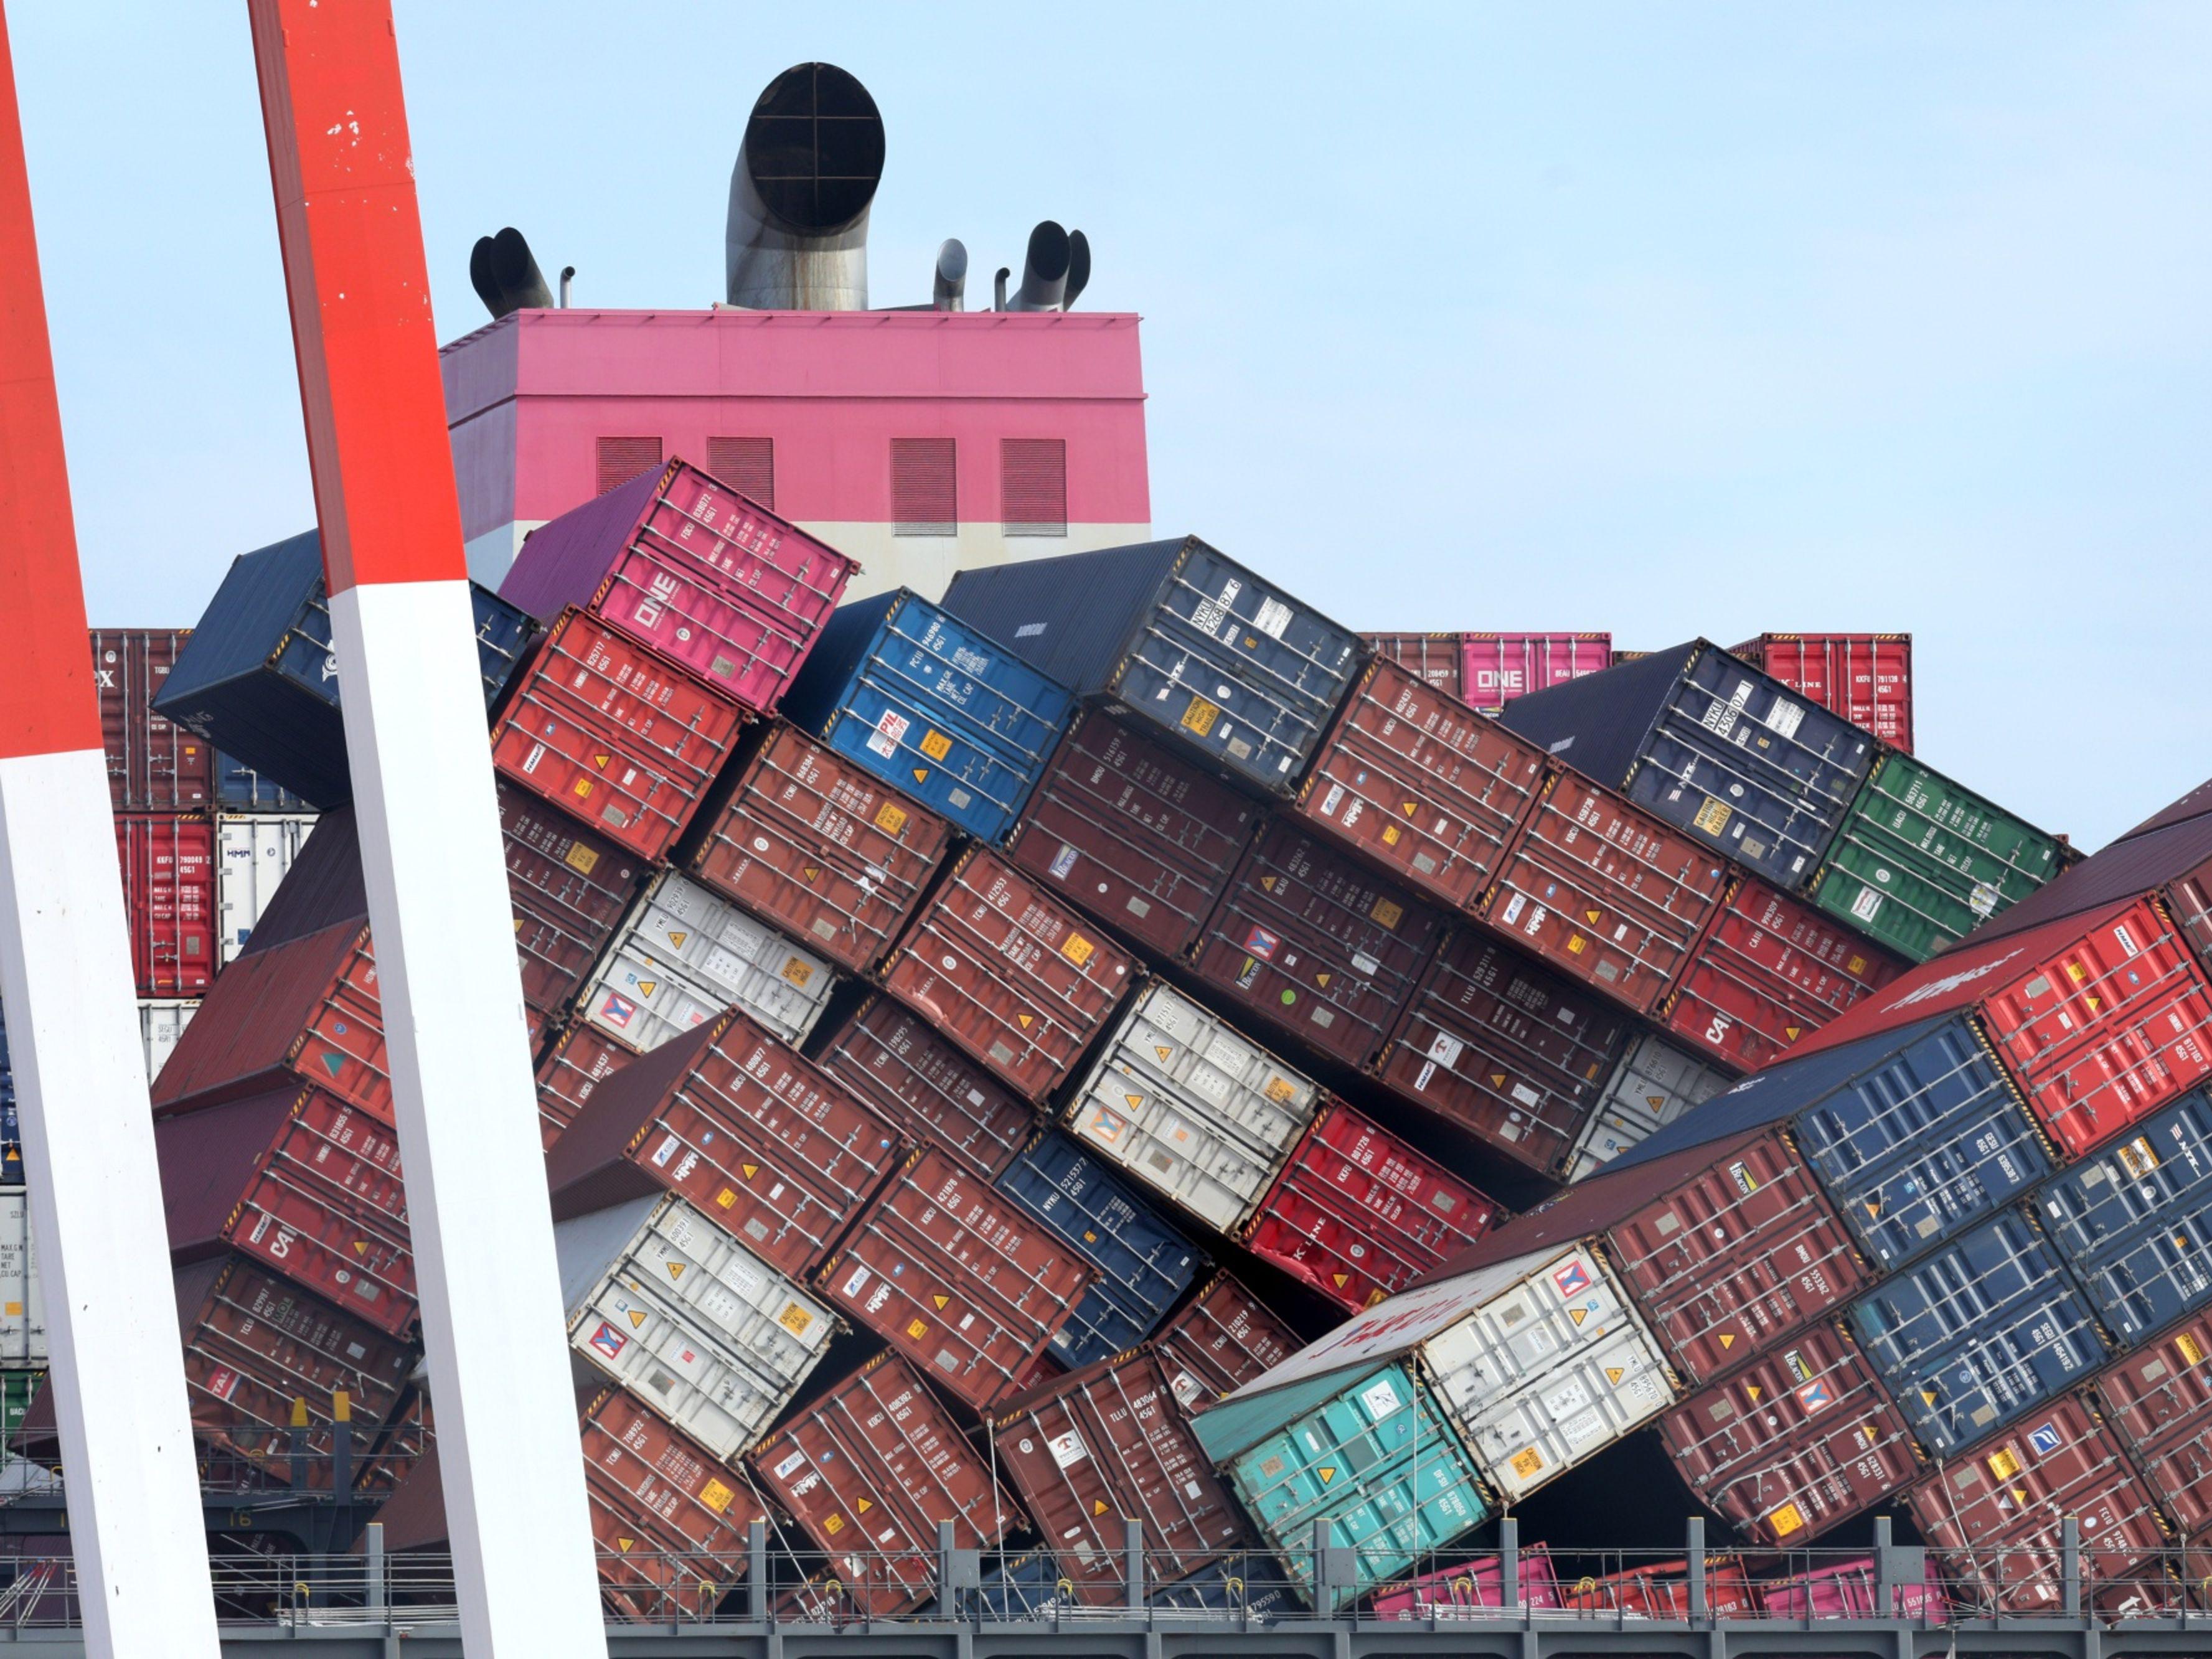 0429 shippingcontainersarefalling